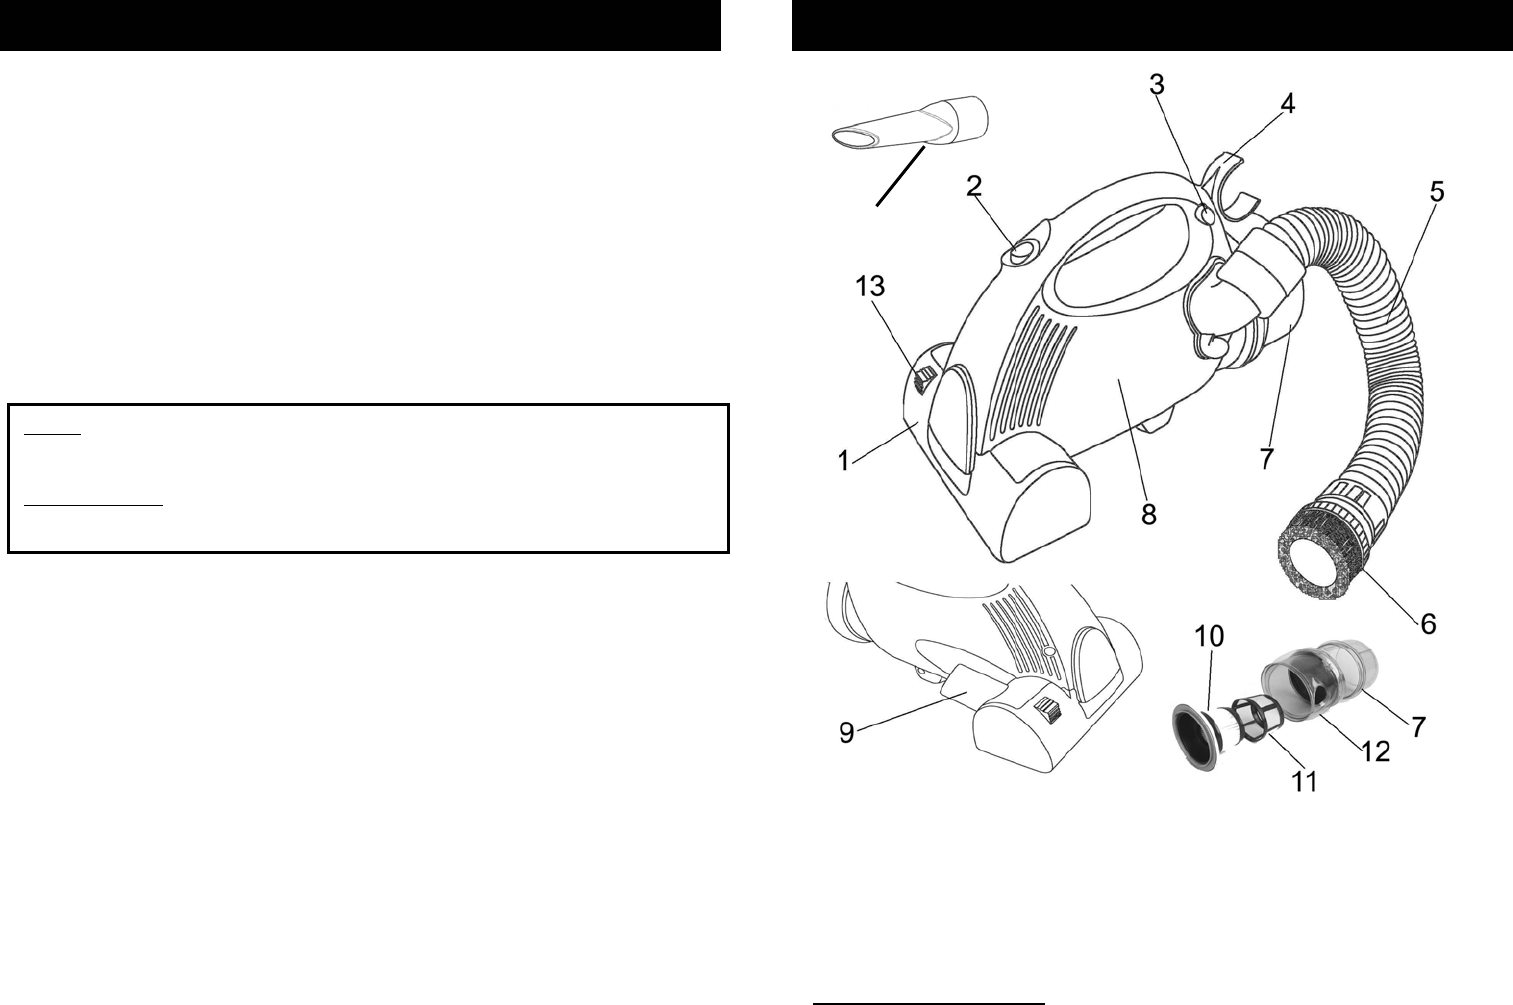 Shark V15Z 1 User Manual To The E68fc0a8 9437 4b15 a9c5